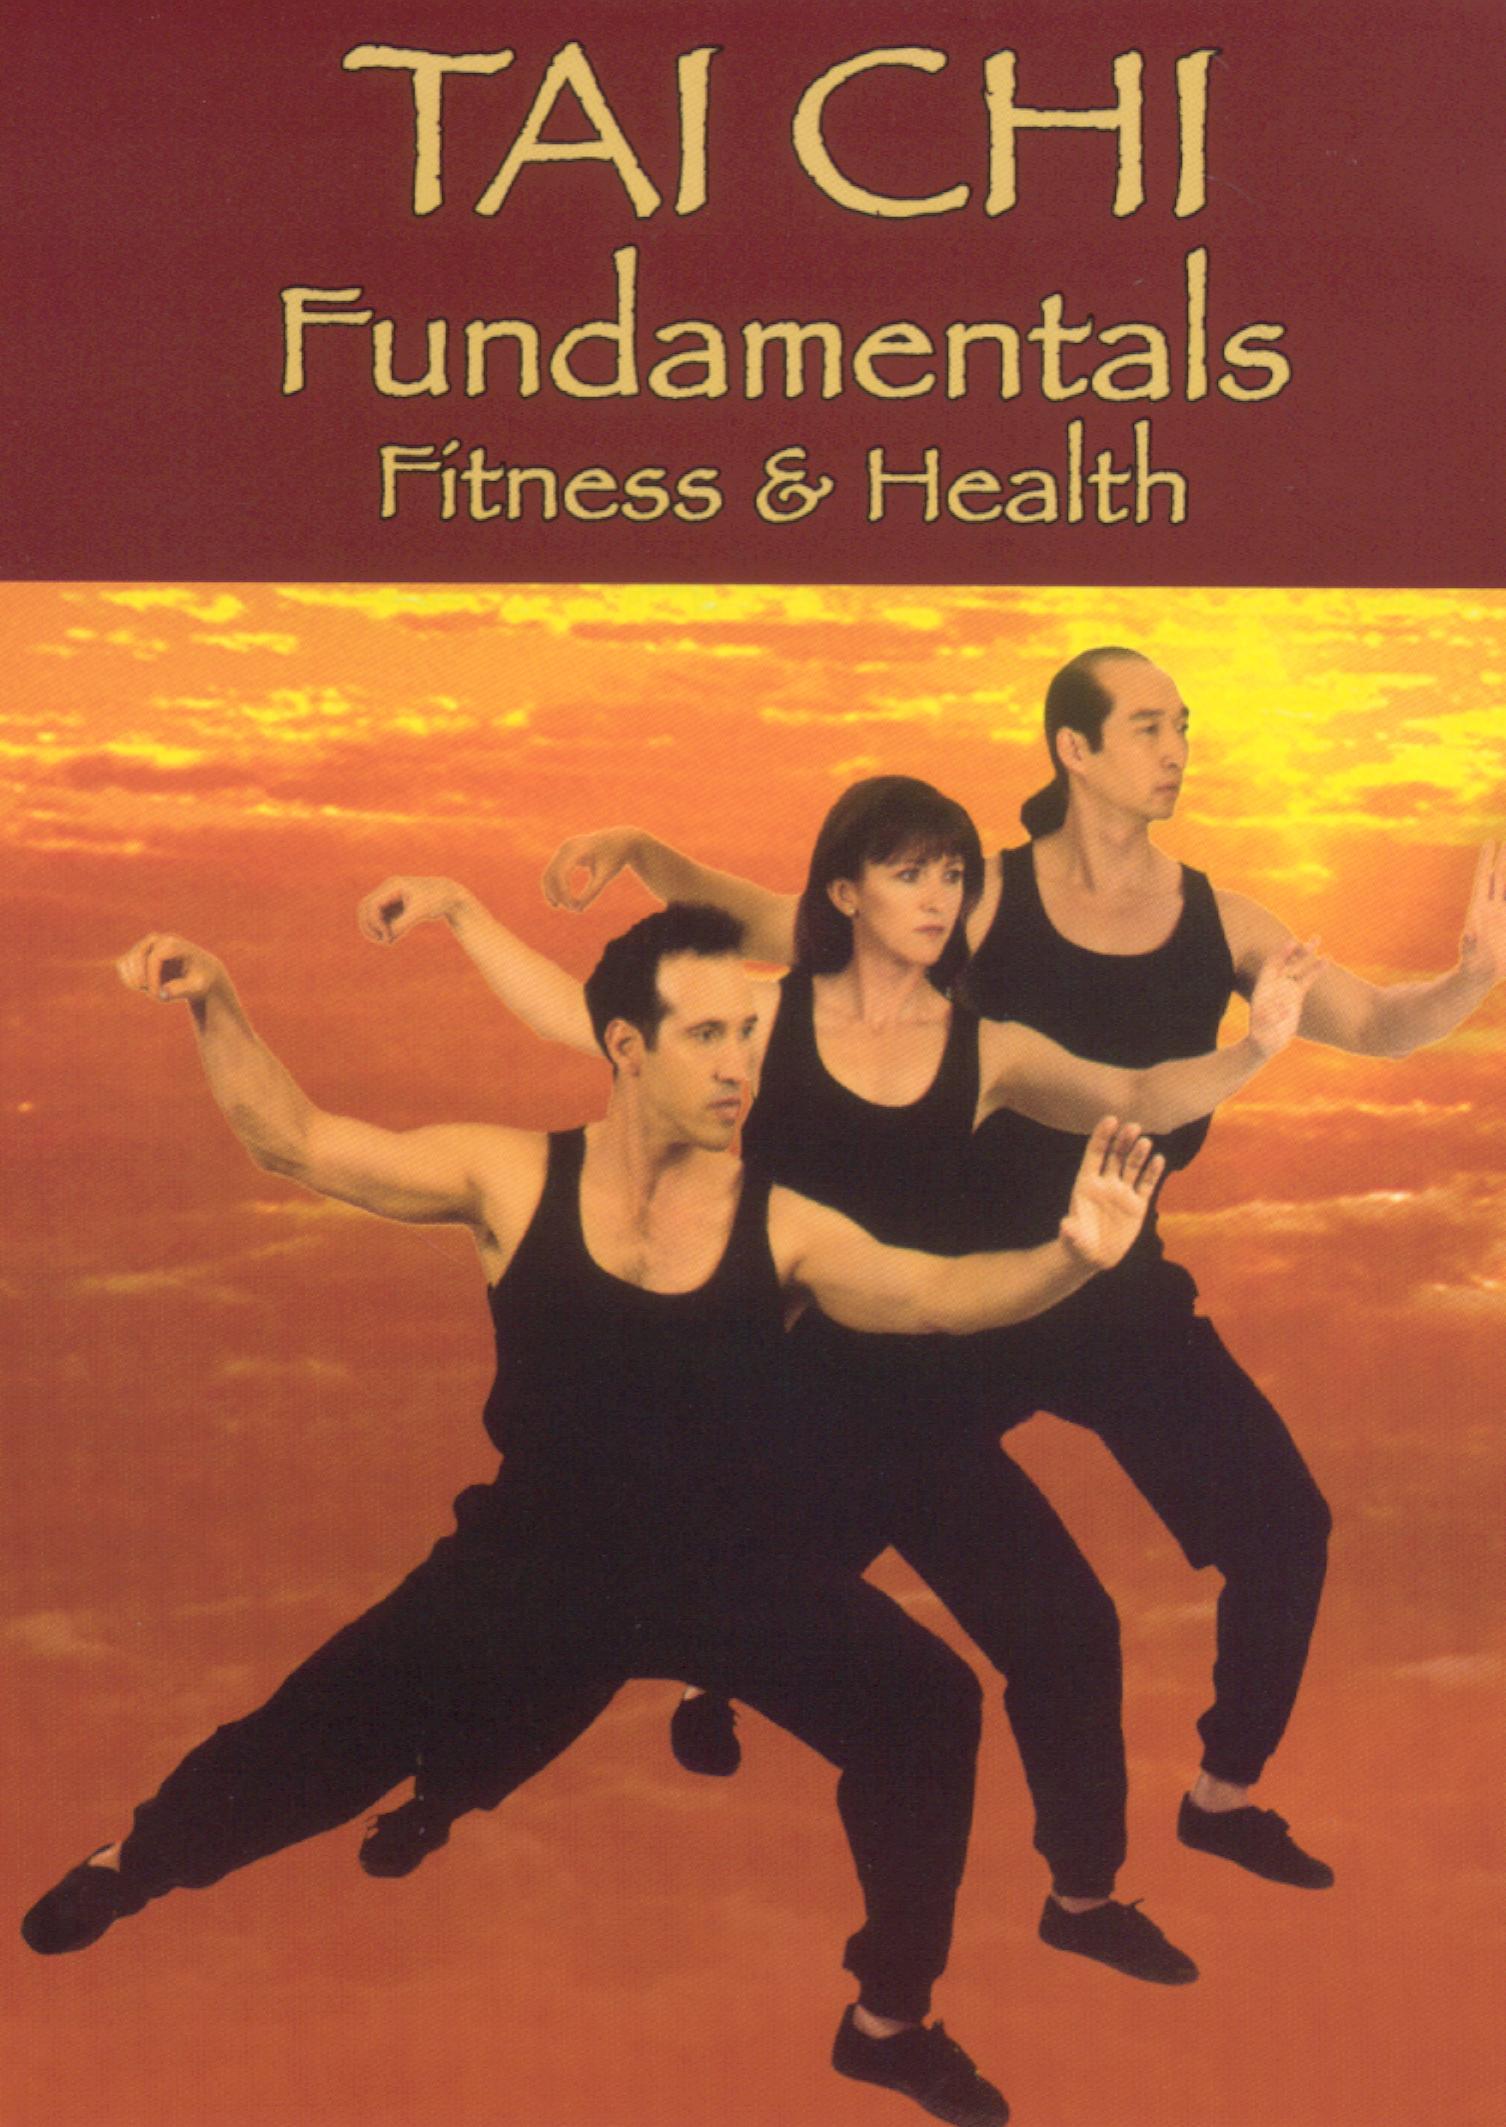 Tai Chi Fundamentals: Fitness & Health